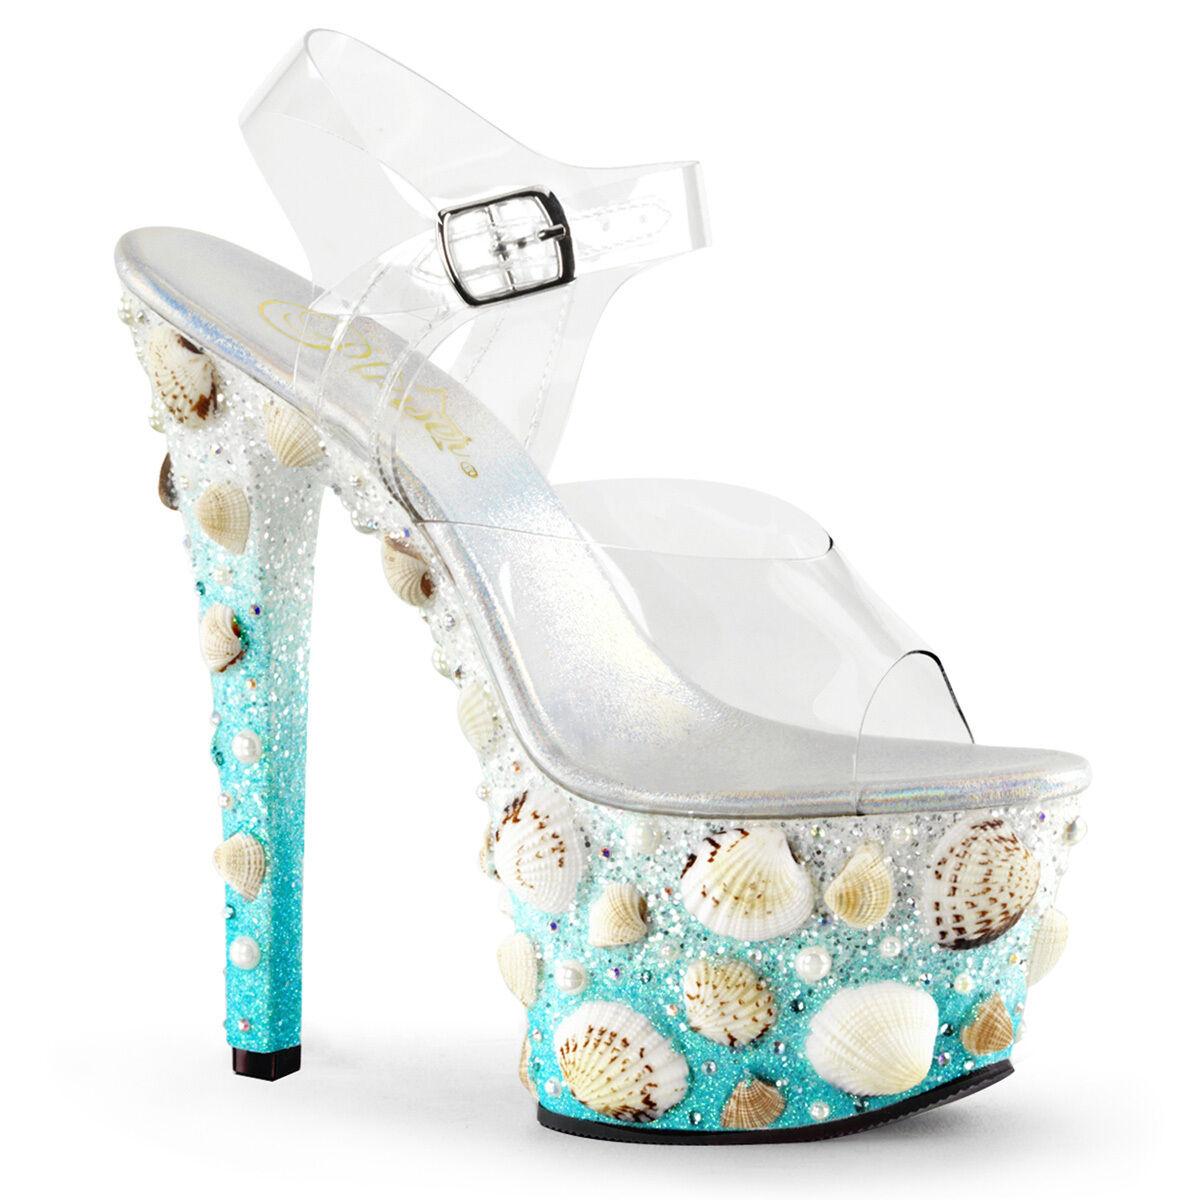 7  Blau Clear Mermaid Cosplay Shells Platform High Heels Stripper schuhe Pleaser